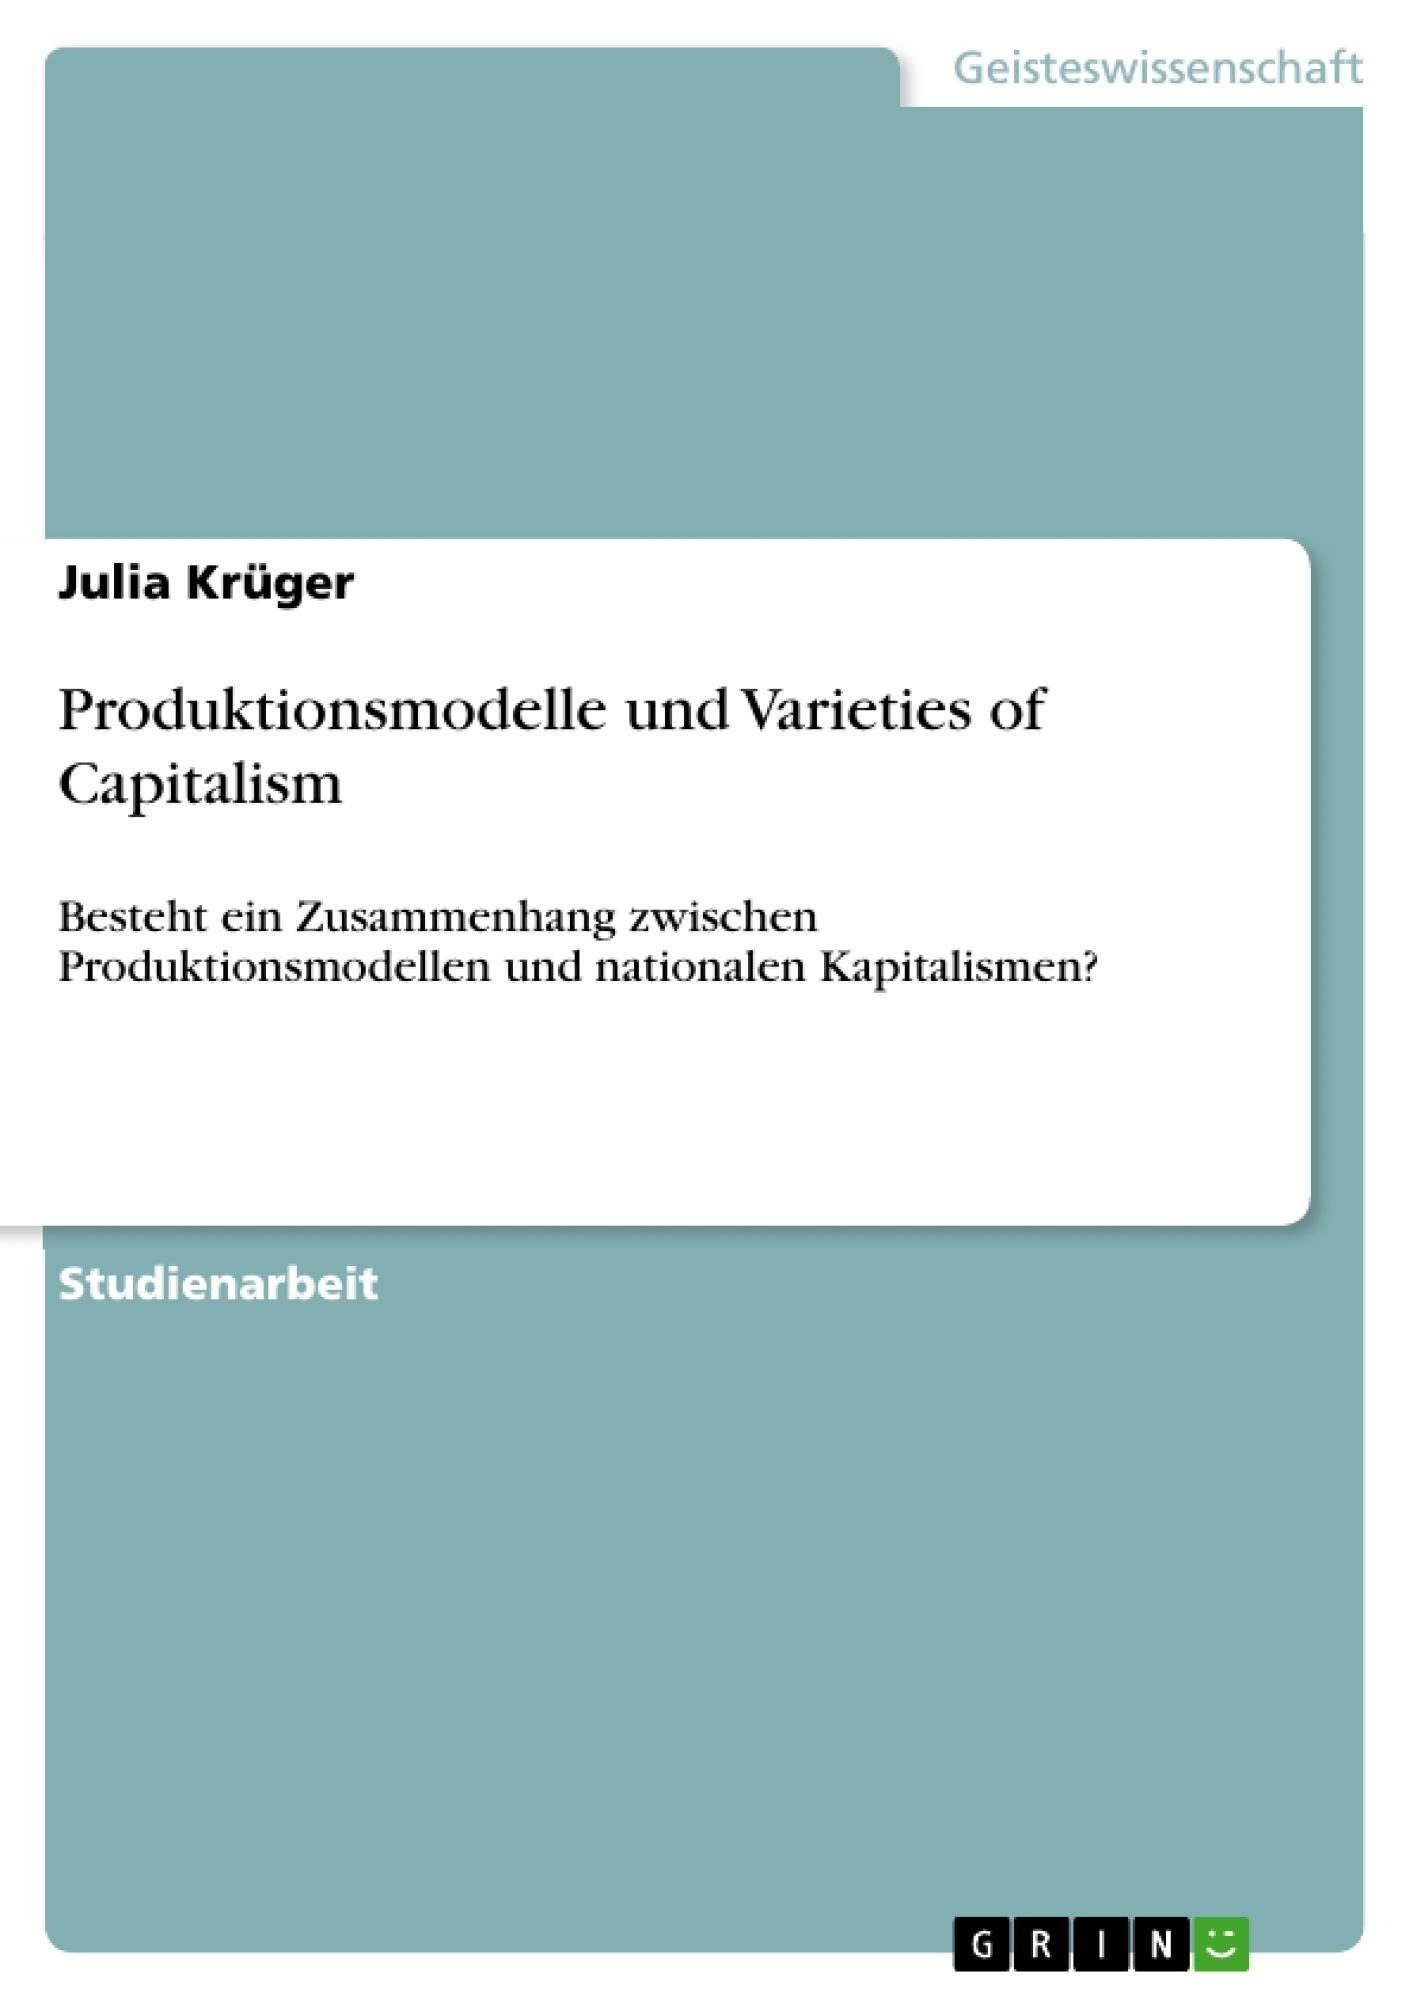 Titel: Produktionsmodelle und Varieties of Capitalism